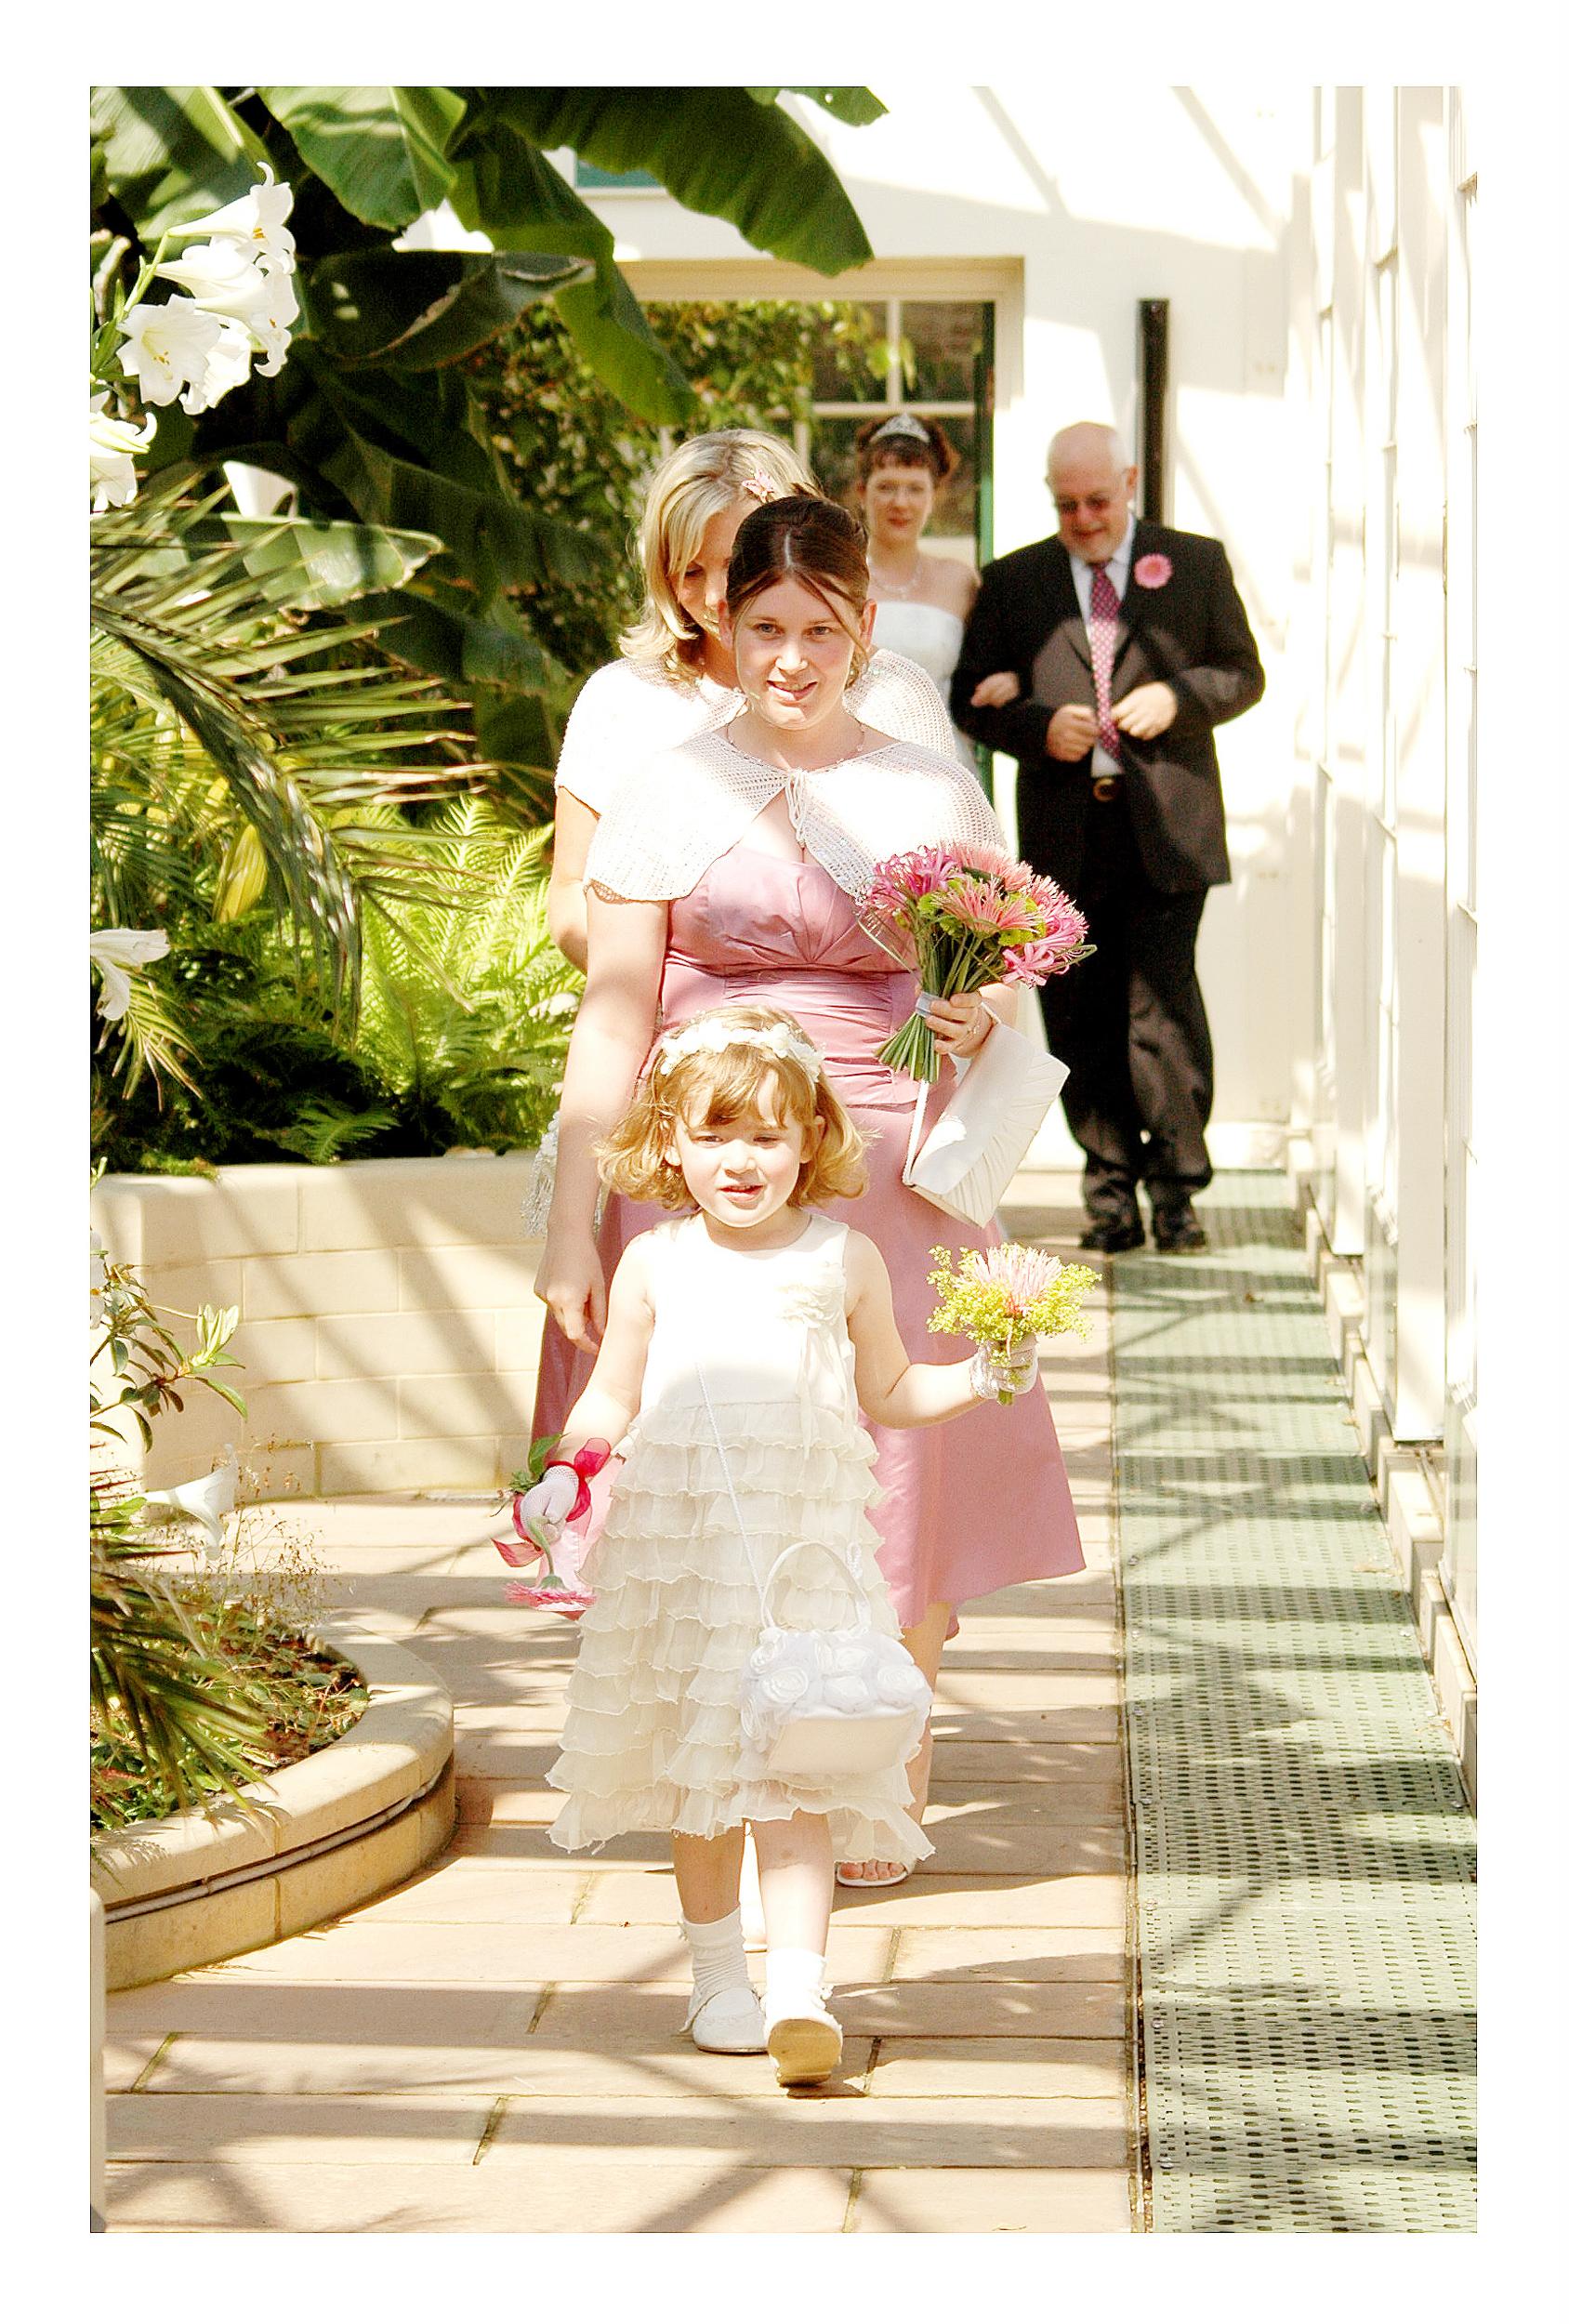 REPORTAGE-WEDDING-PHOTOGRAPHY-SET-UK-4.jpg